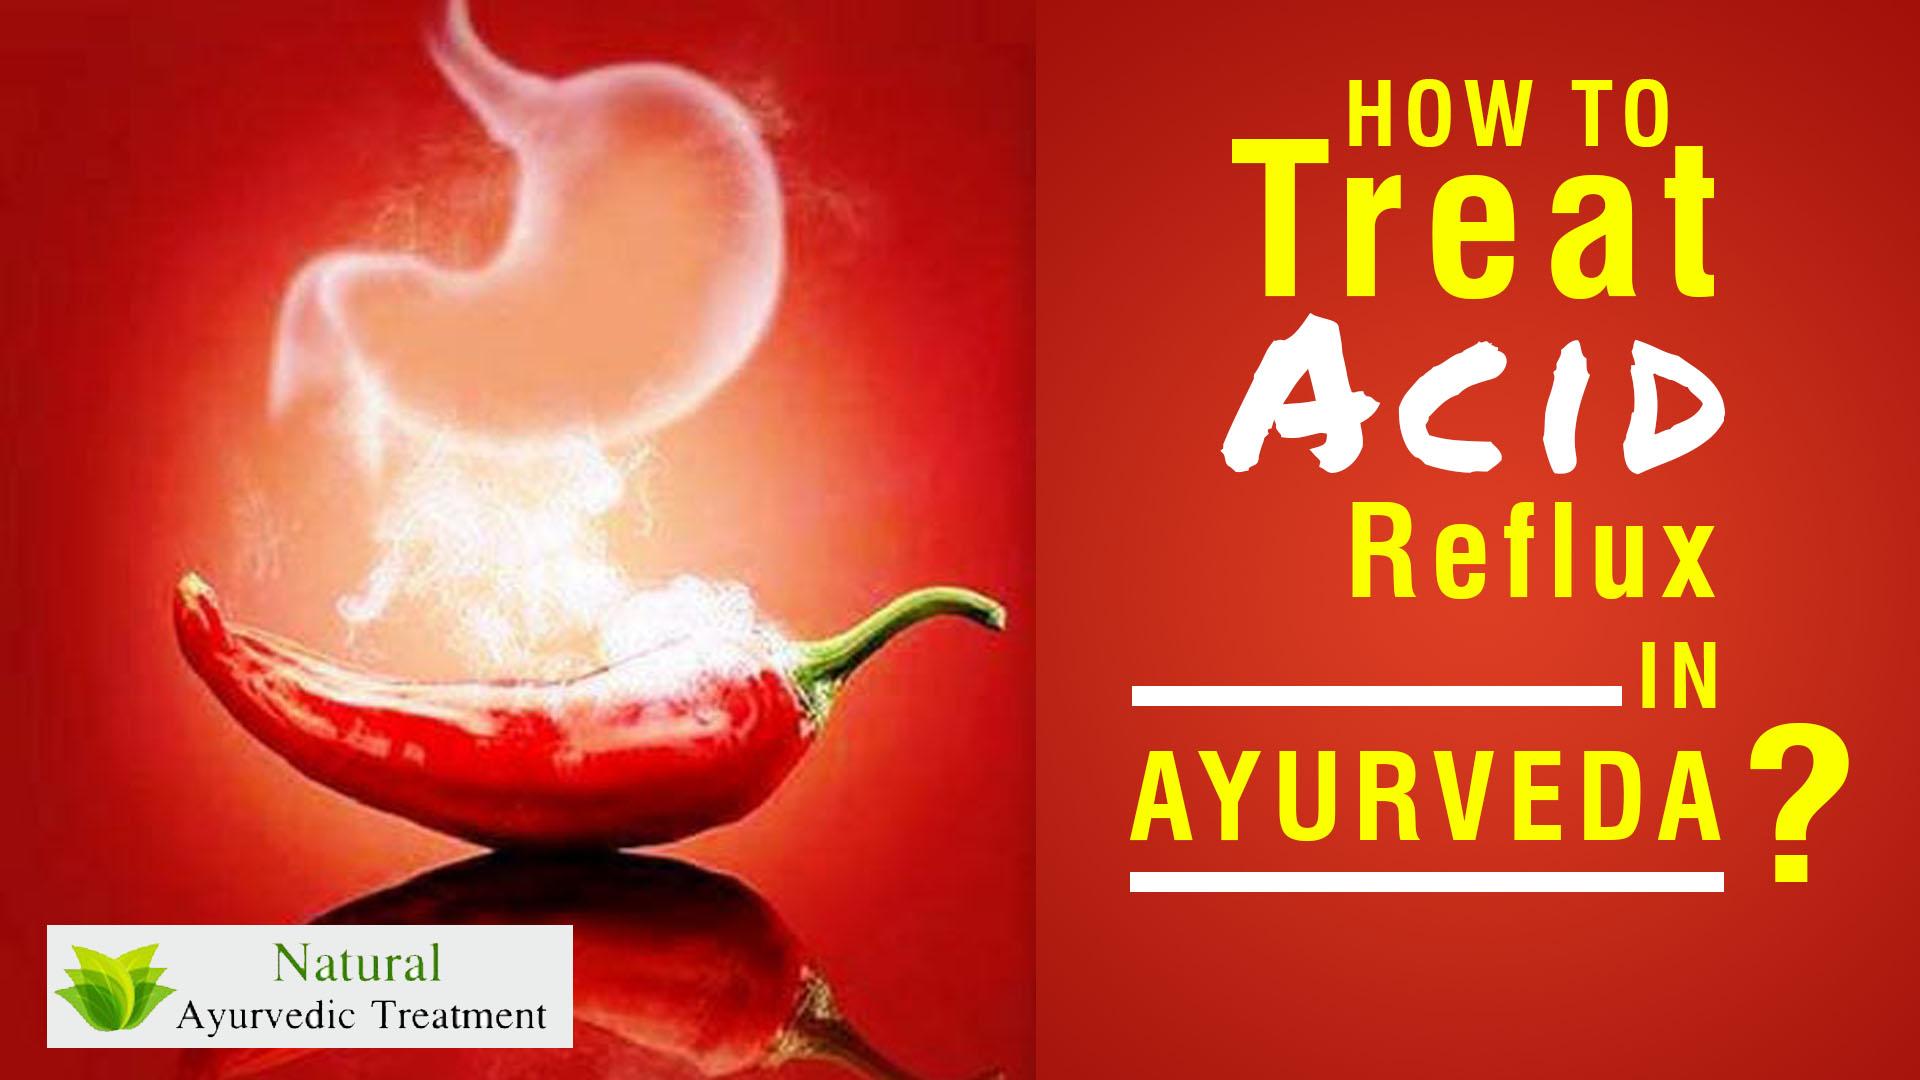 How to Treat Acid Reflux in Ayurveda?